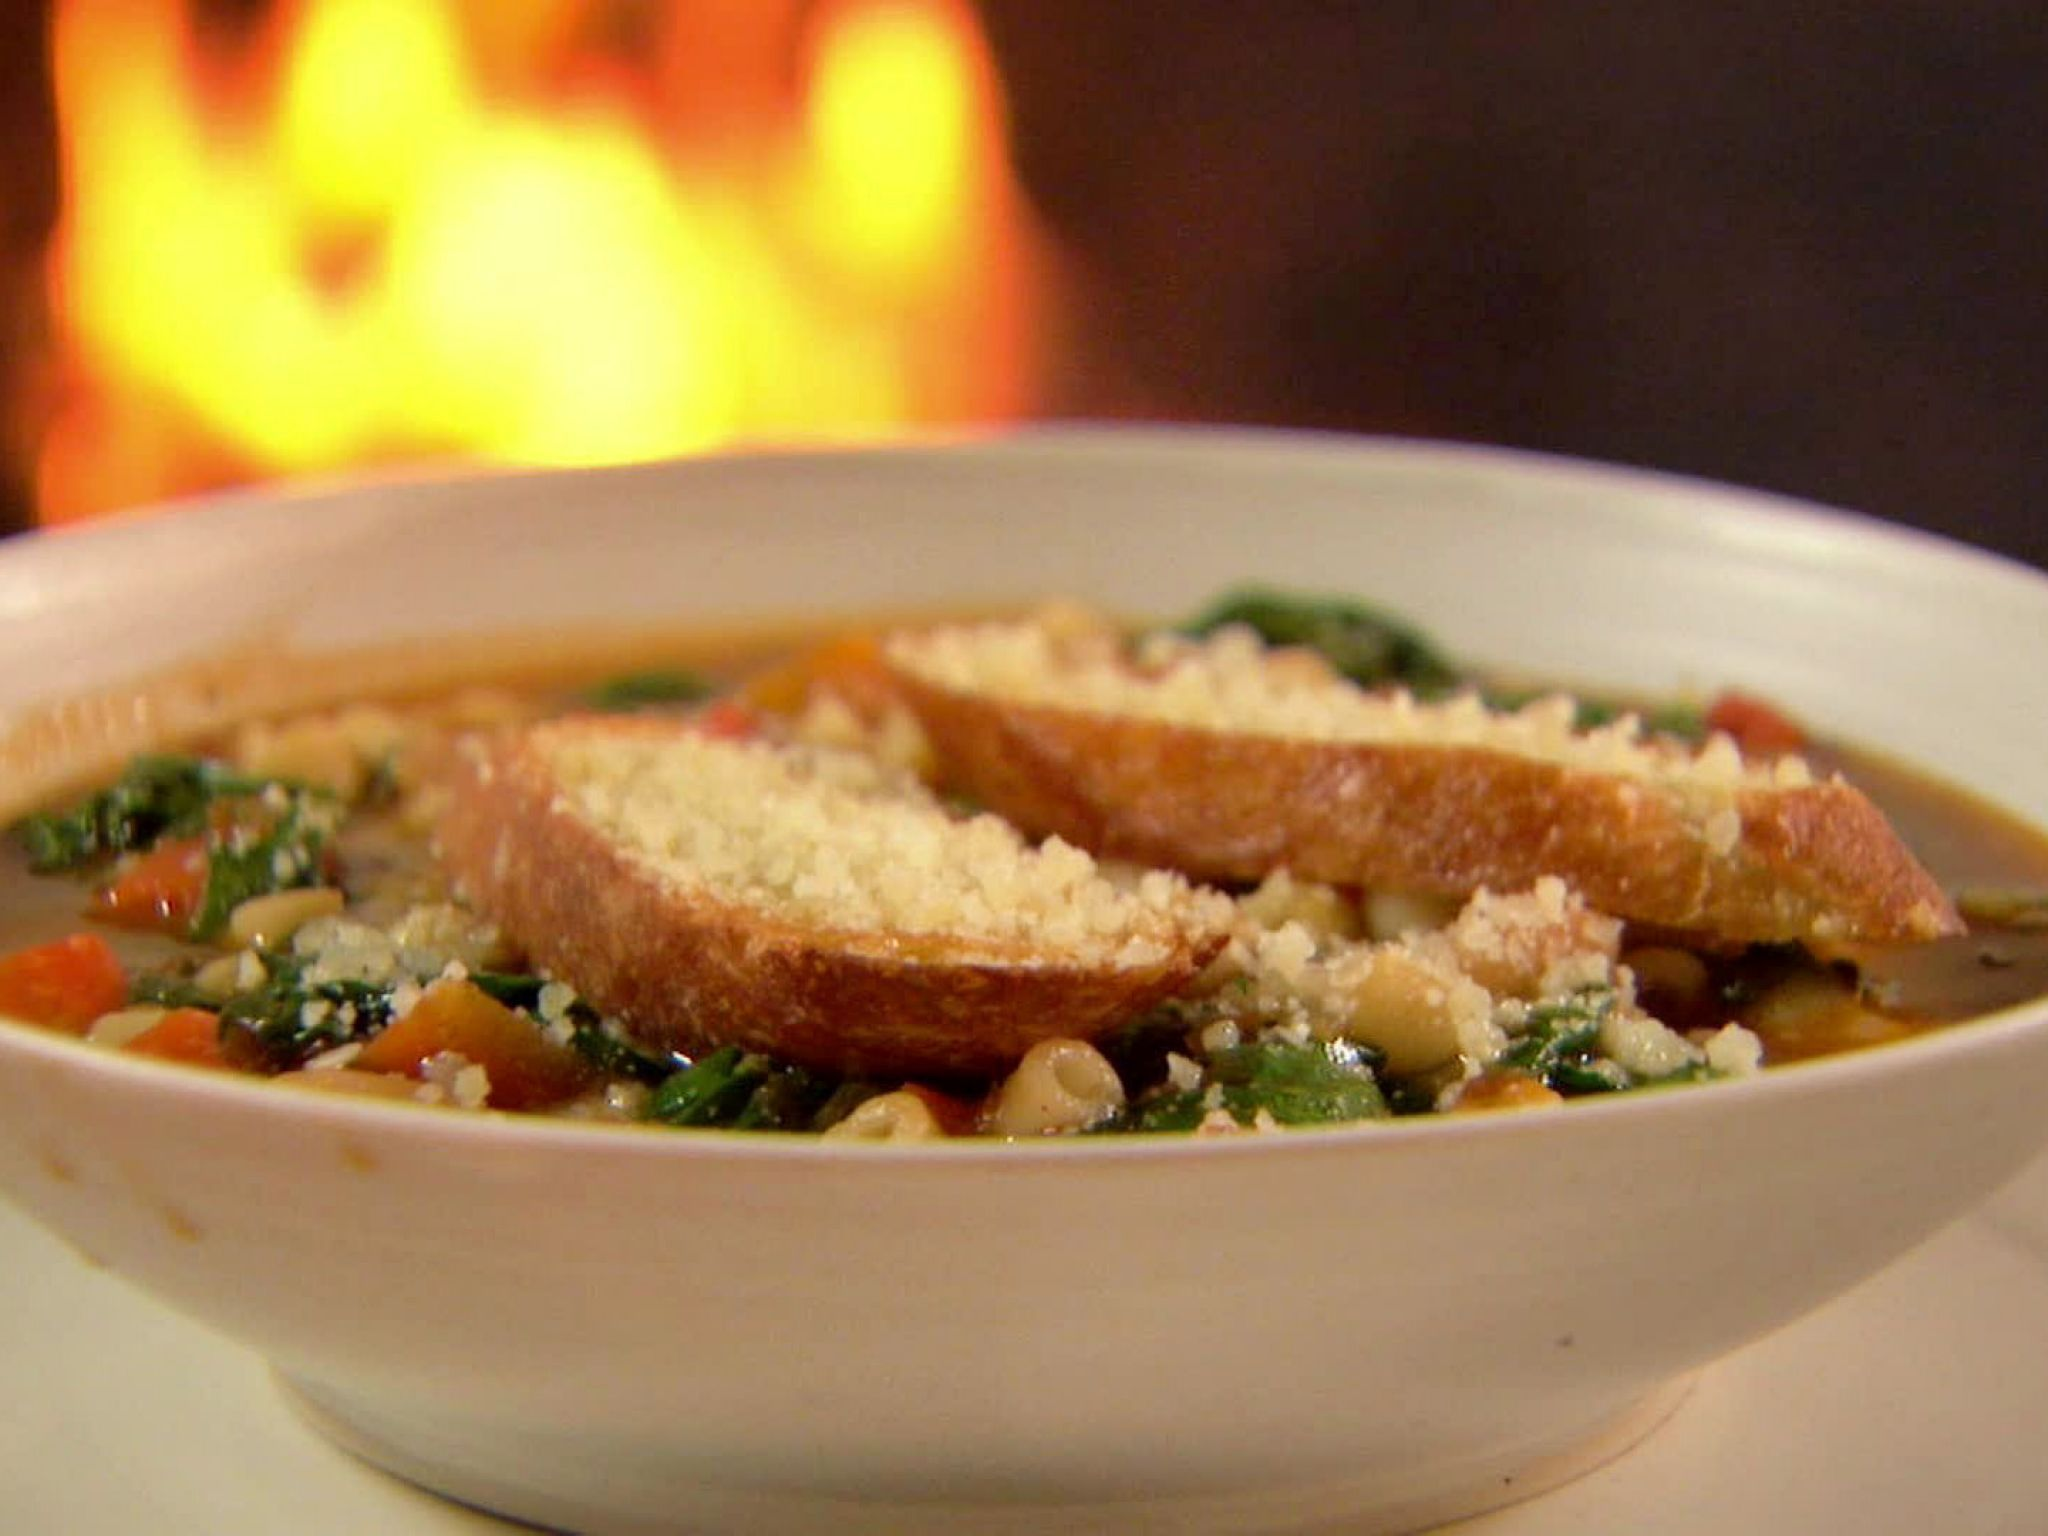 Ina Garten Soup Winter Minestrone And Garlic Bruschetta  Recipe  Ina Garten